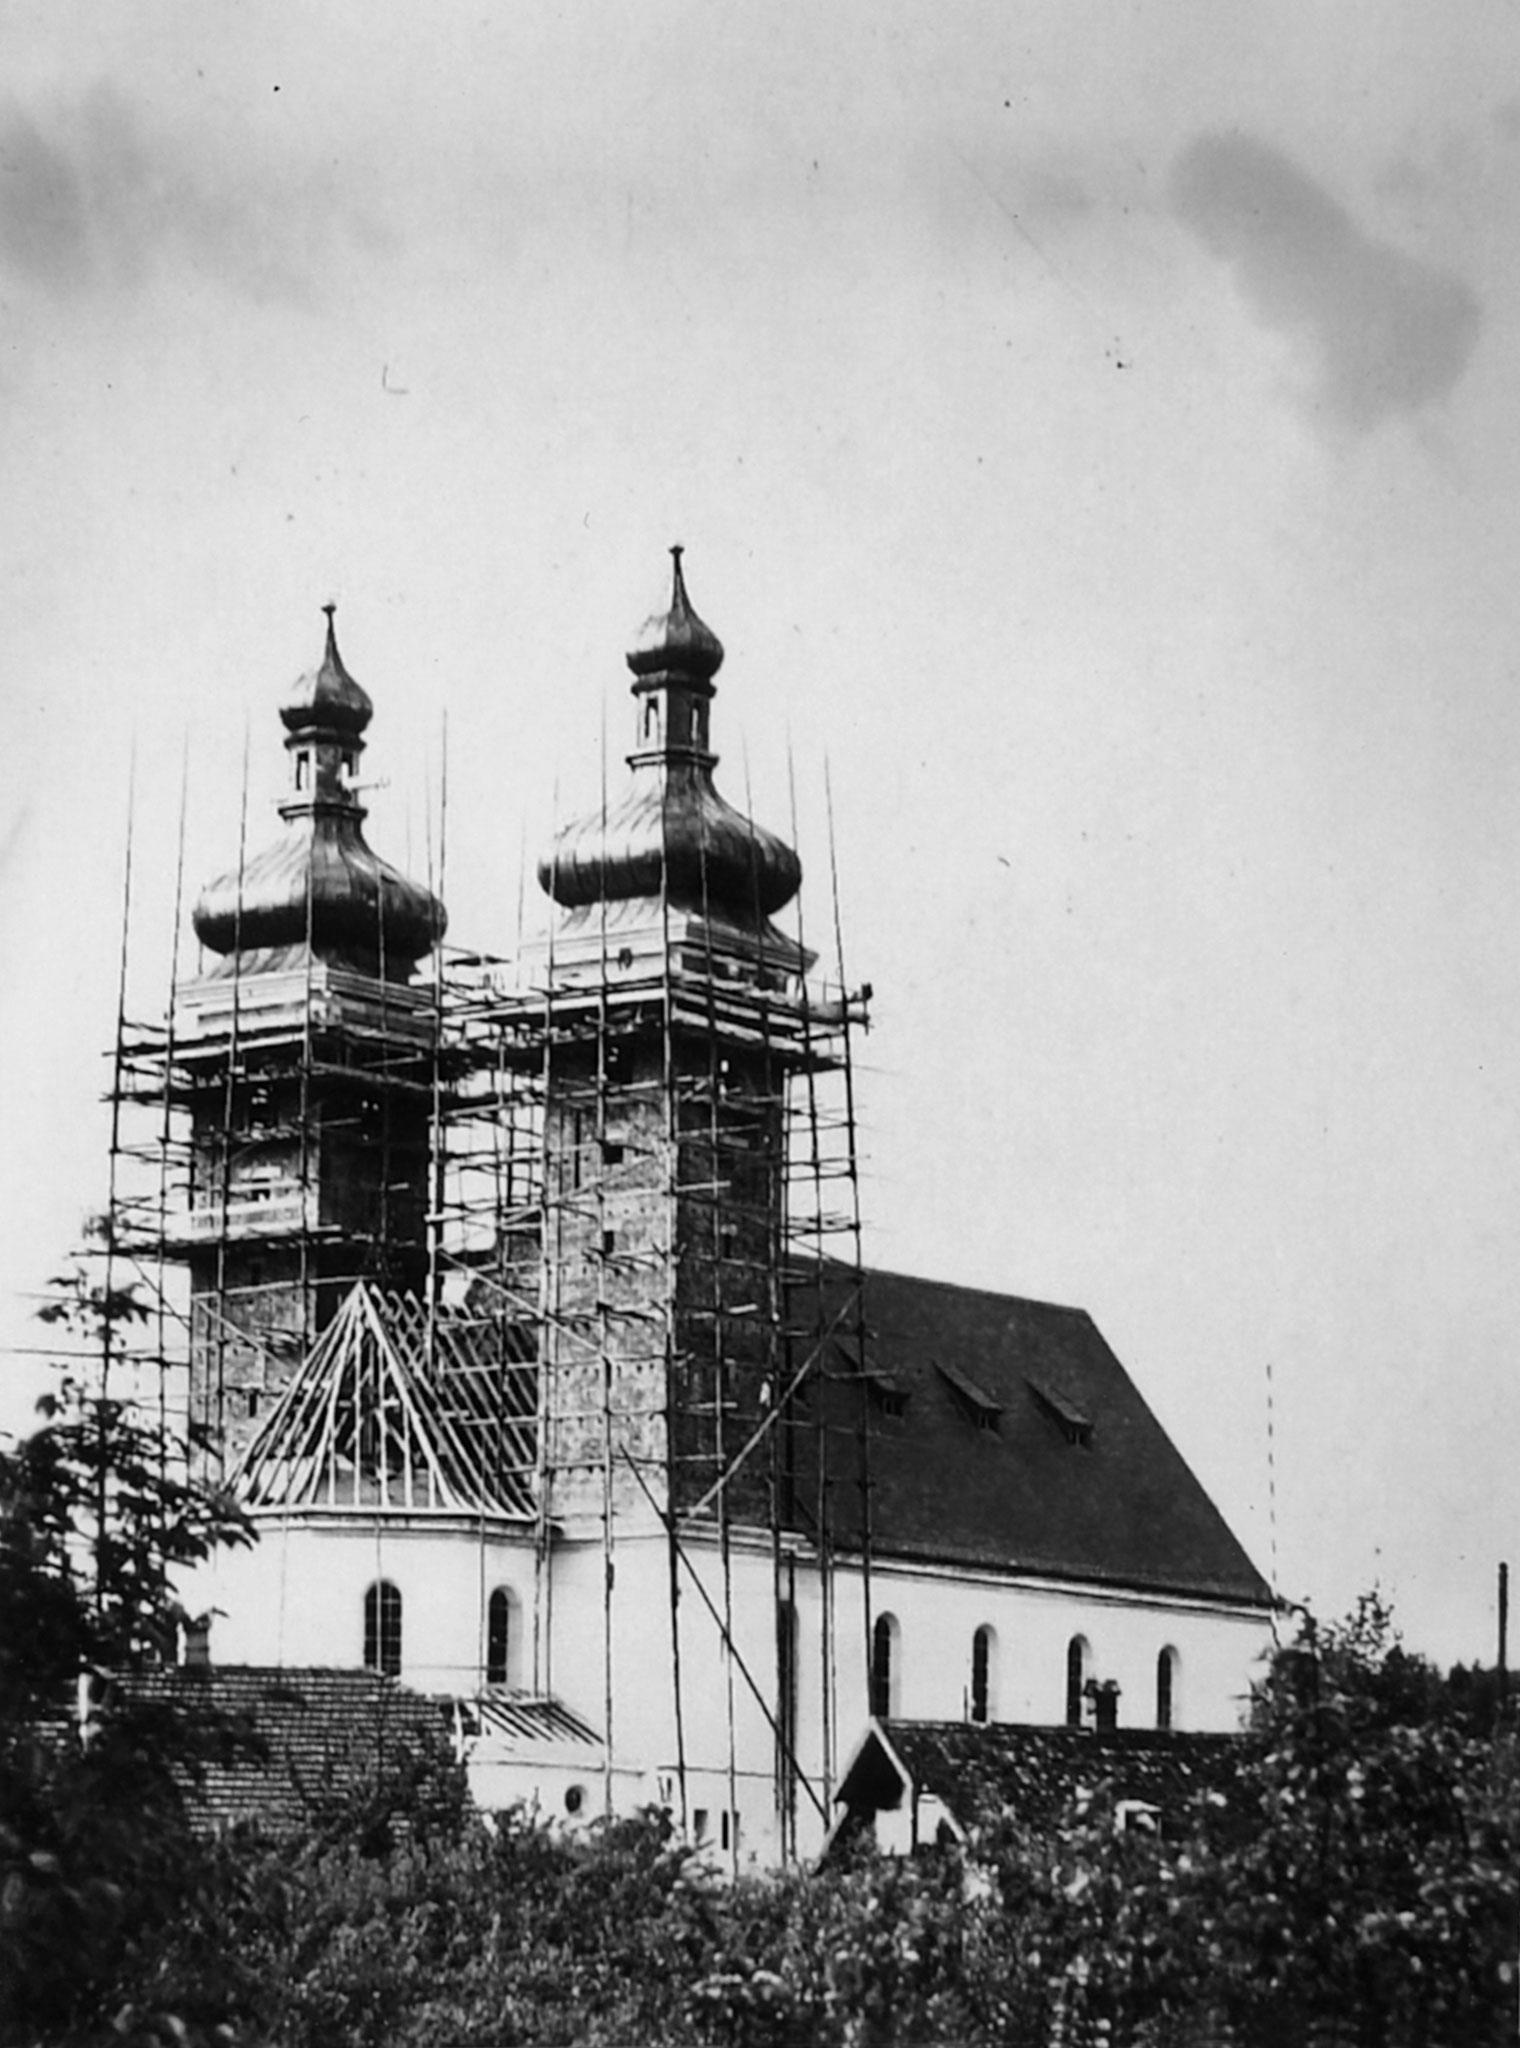 Pfarrkirche St. Joseph im Bau, Foto 1927